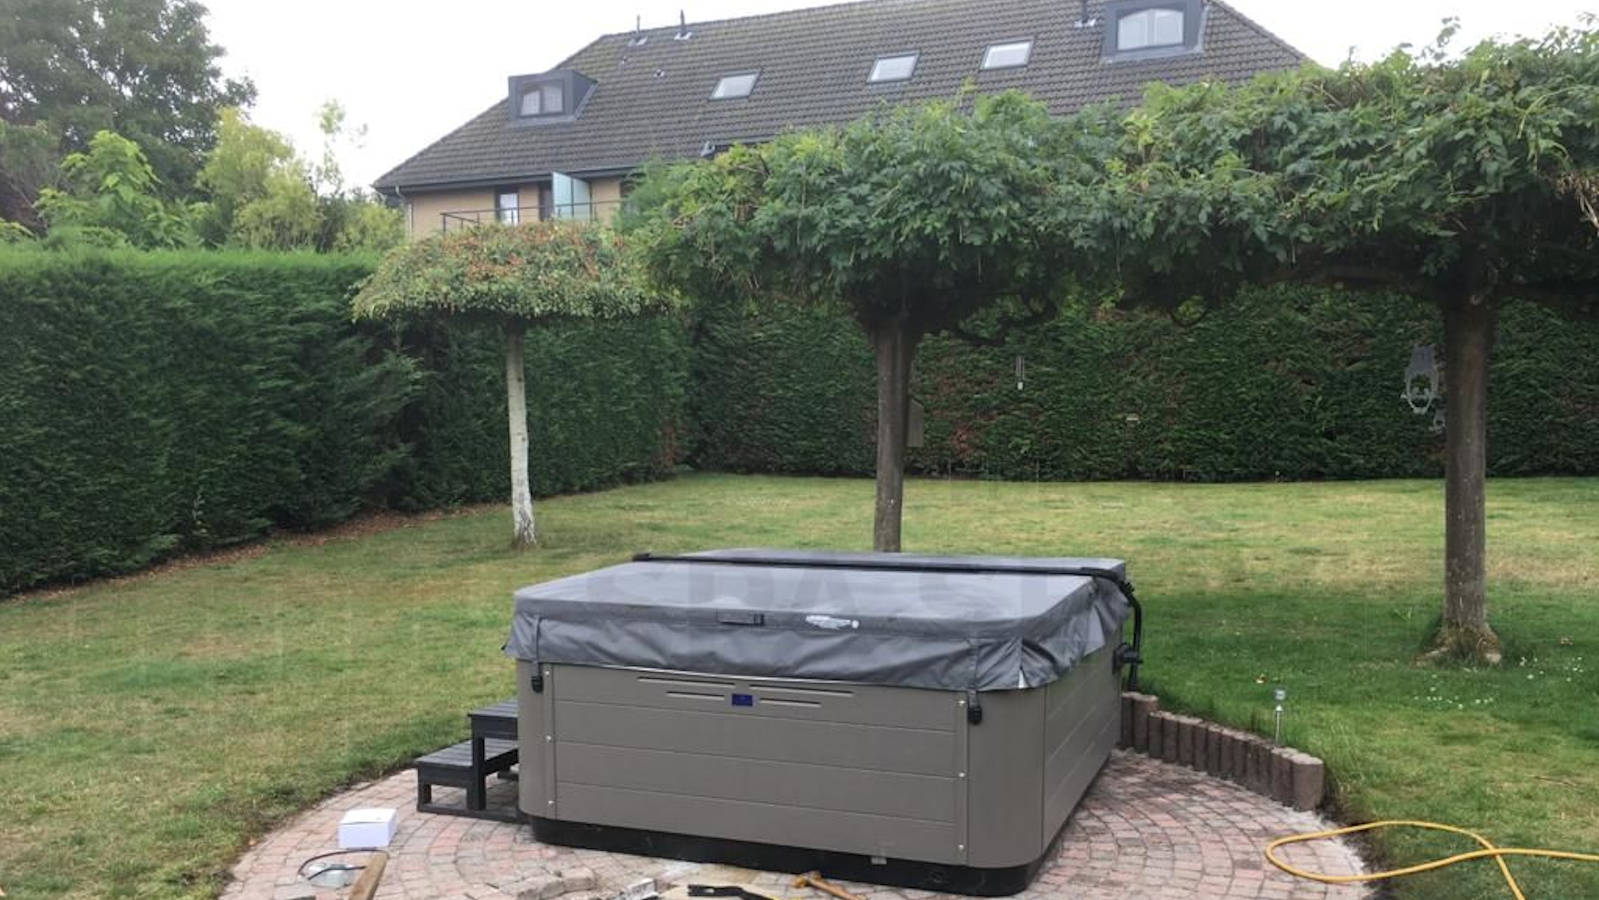 Verhuizing van een Villeroy & Boch R6L spa in Heverlee België